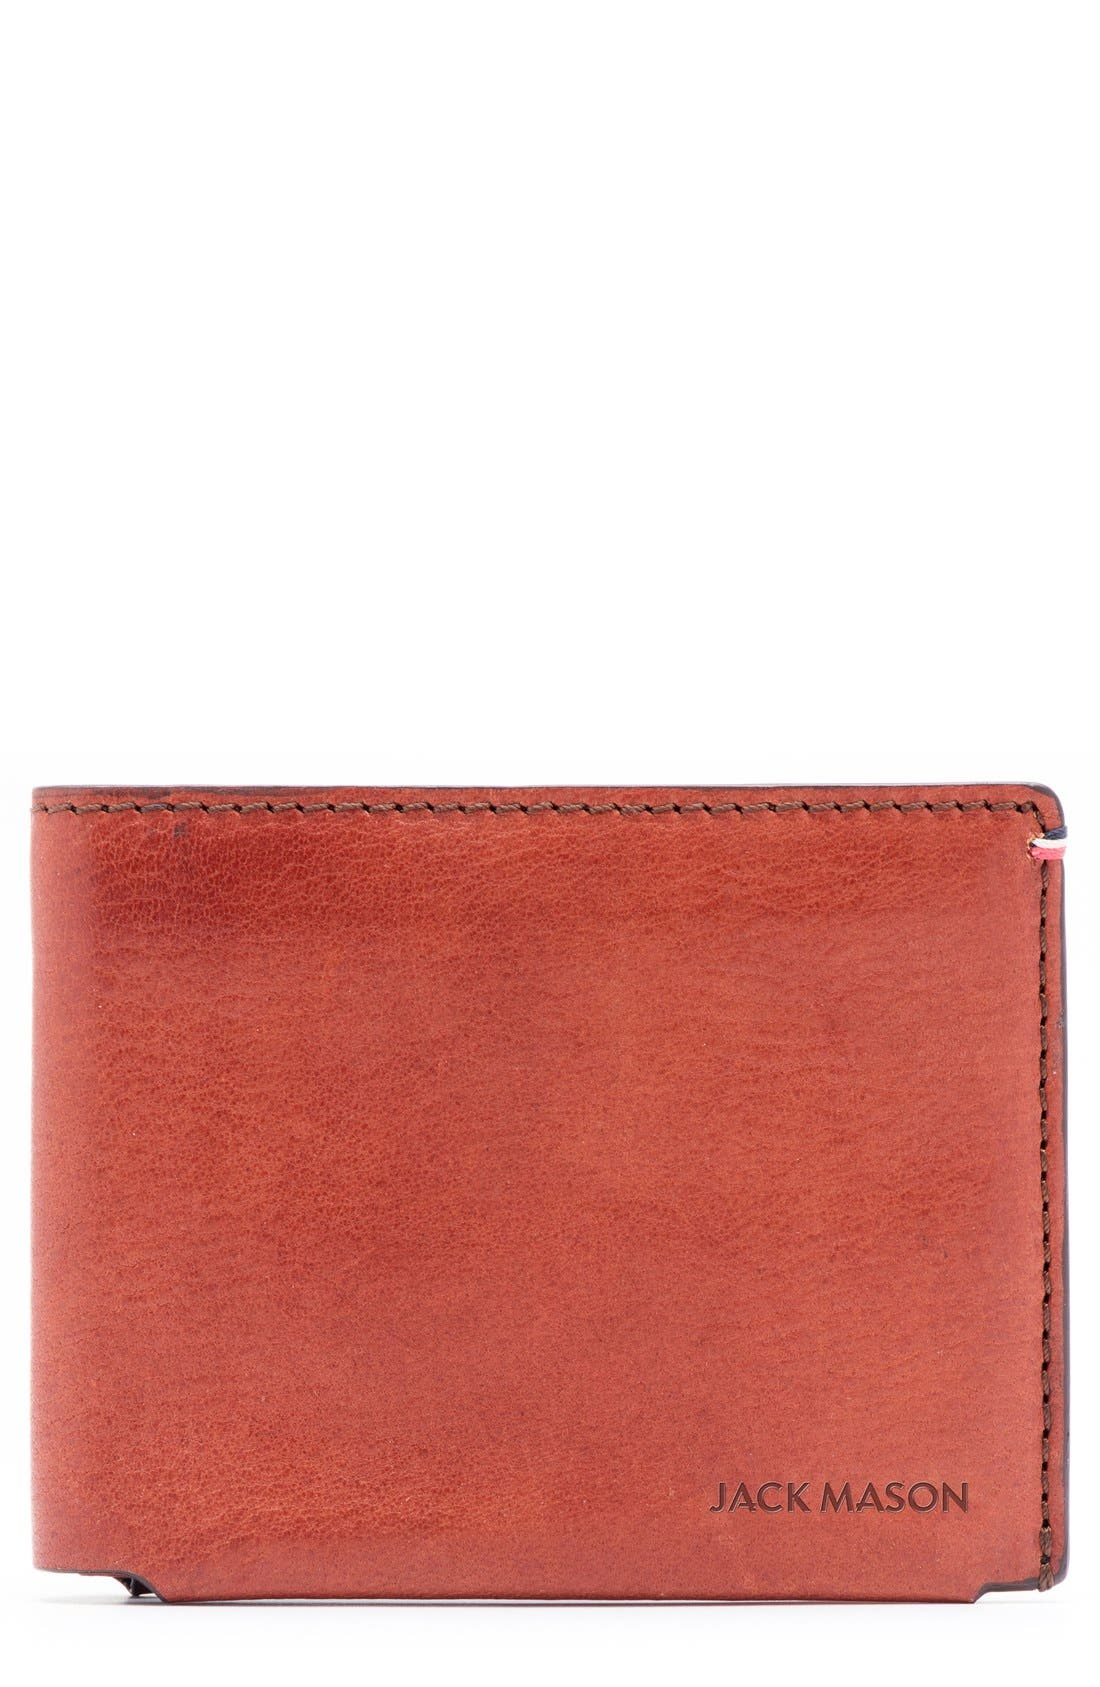 Jack Mason Pebbled Leather Wallet